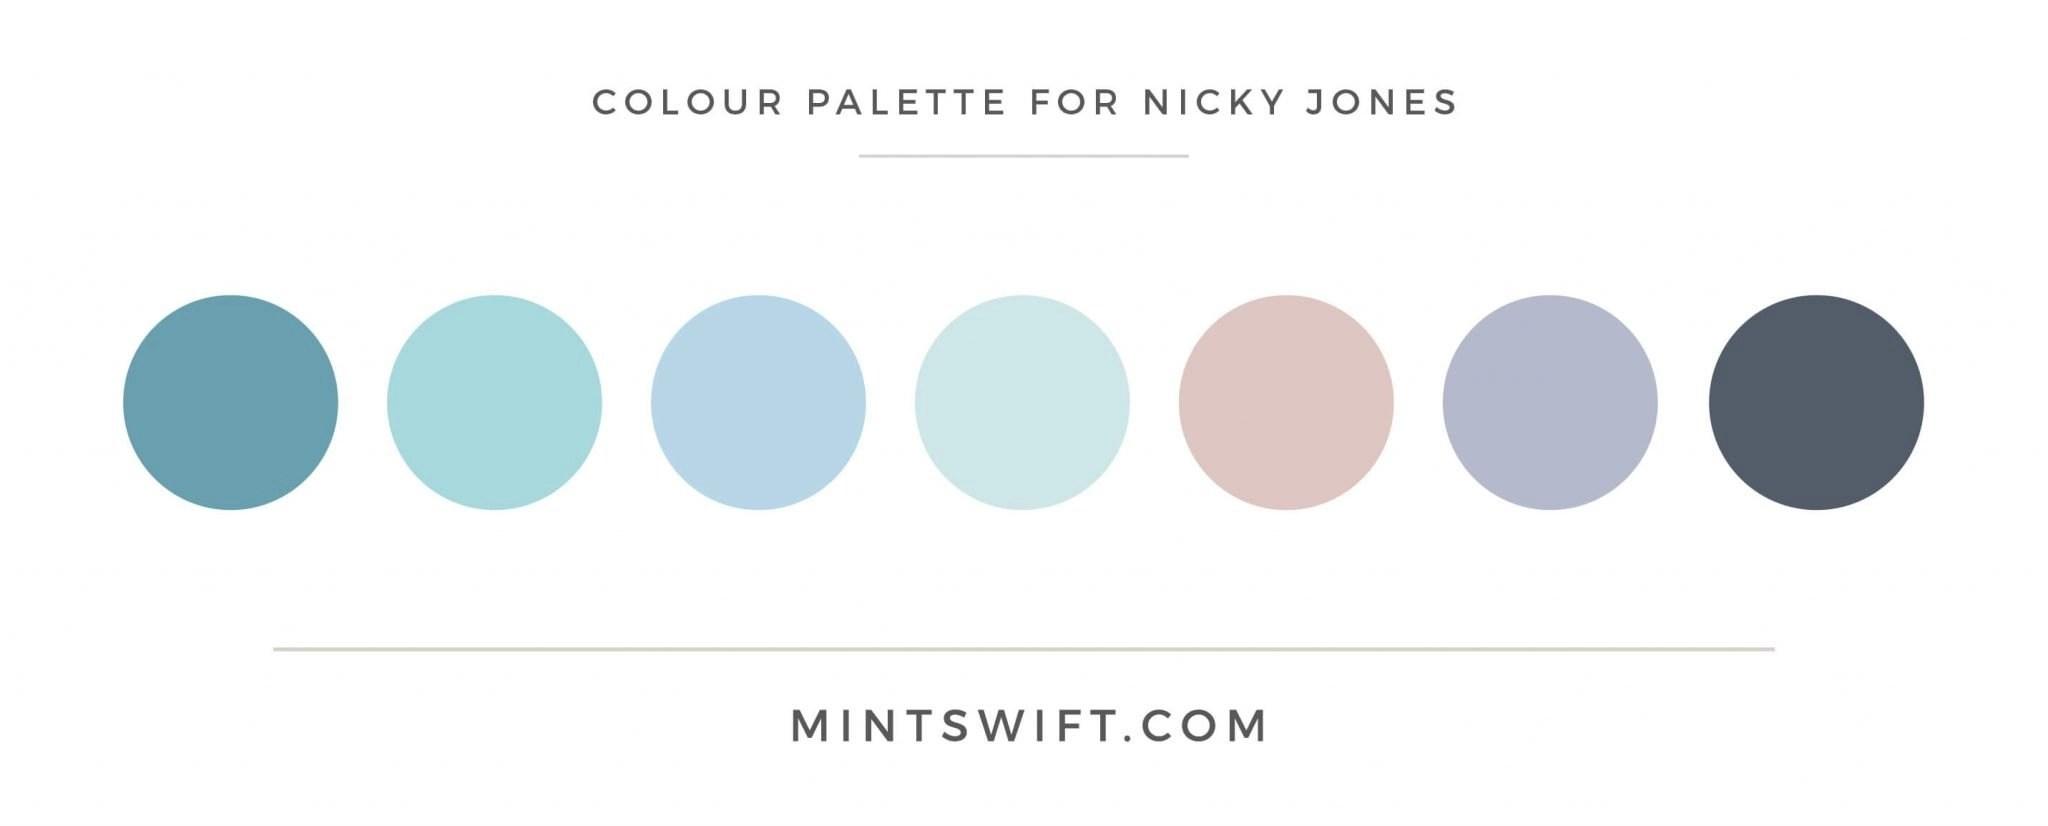 Nicky Jones - Colour Palette - Brand Design Package - MintSwift